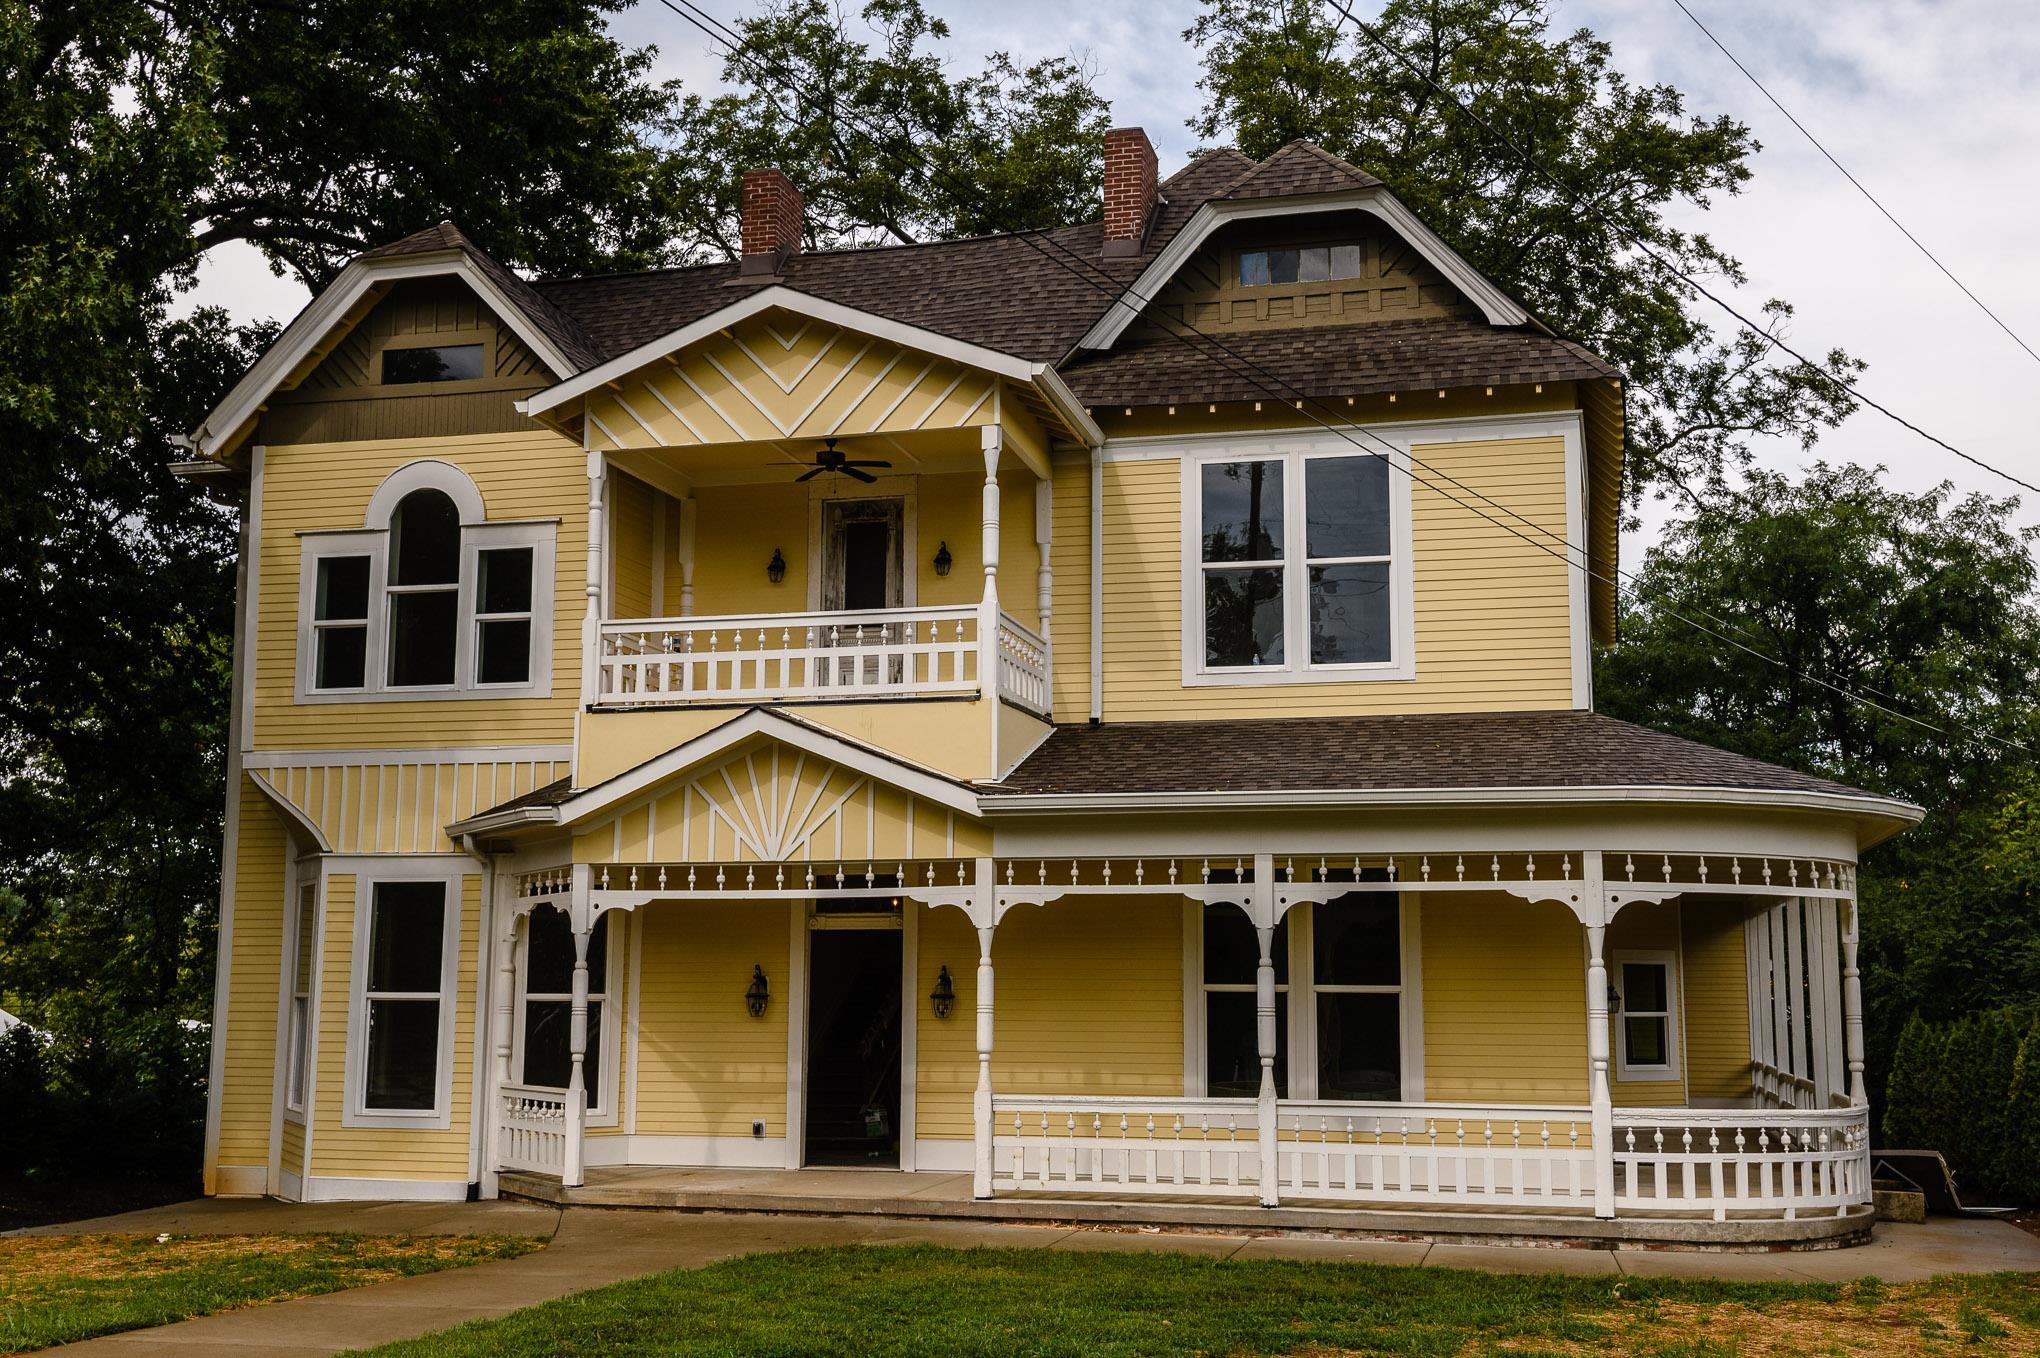 501 Belmont Ave, Shelbyville, TN 37160 - Shelbyville, TN real estate listing